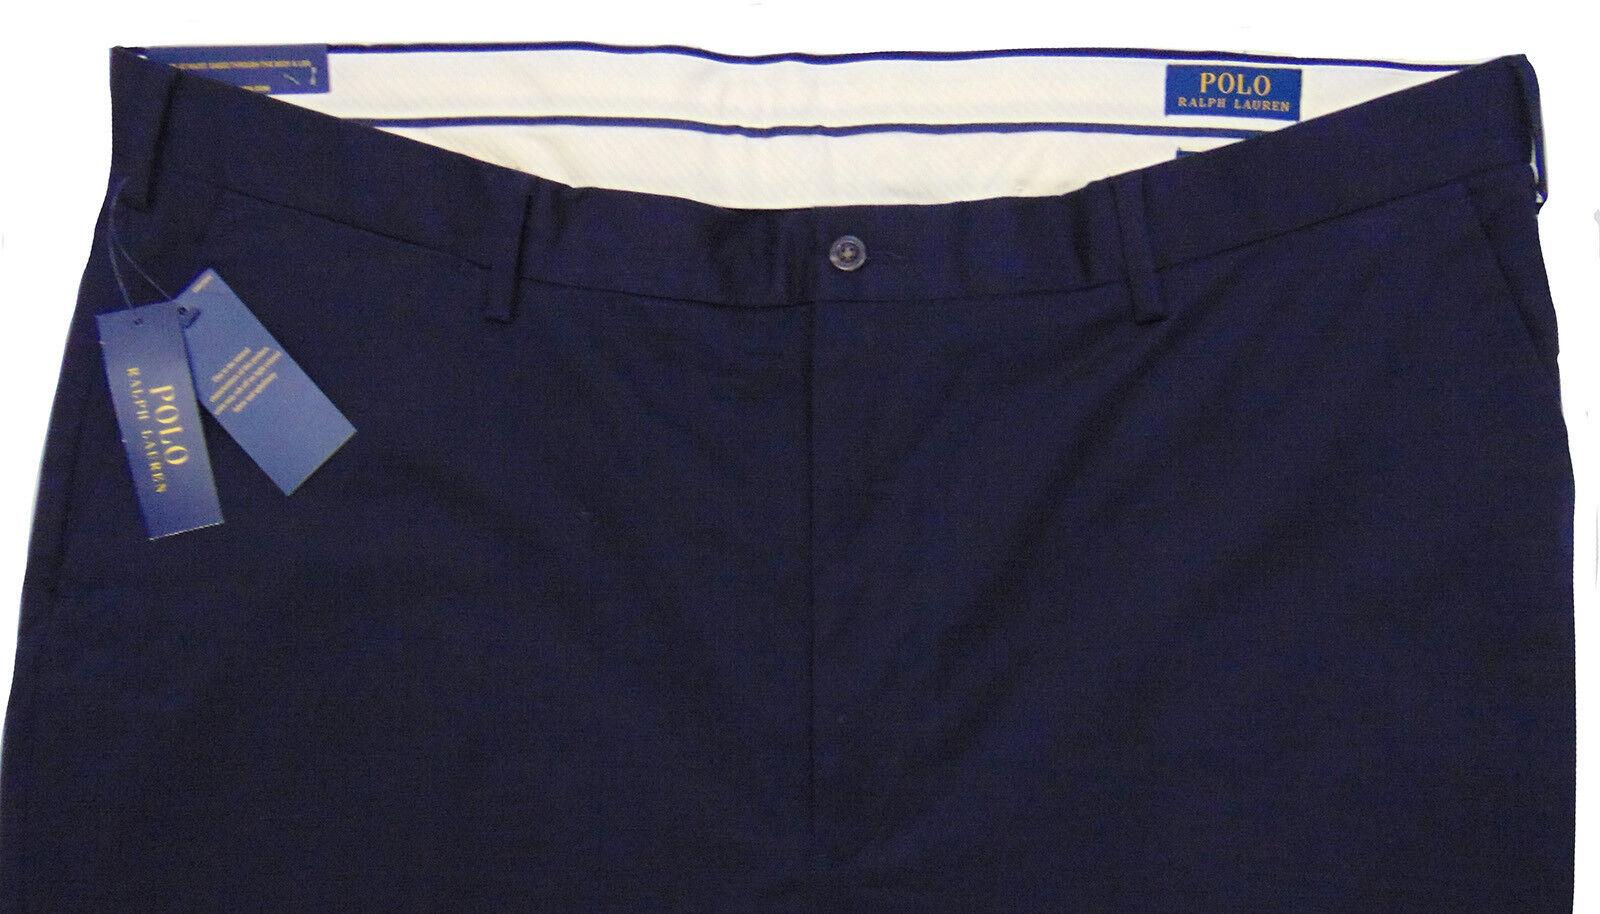 Men's POLO RALPH LAUREN Navy bluee Pants 50x32 50Bx32 NEW NWT Stretch Classic Fit